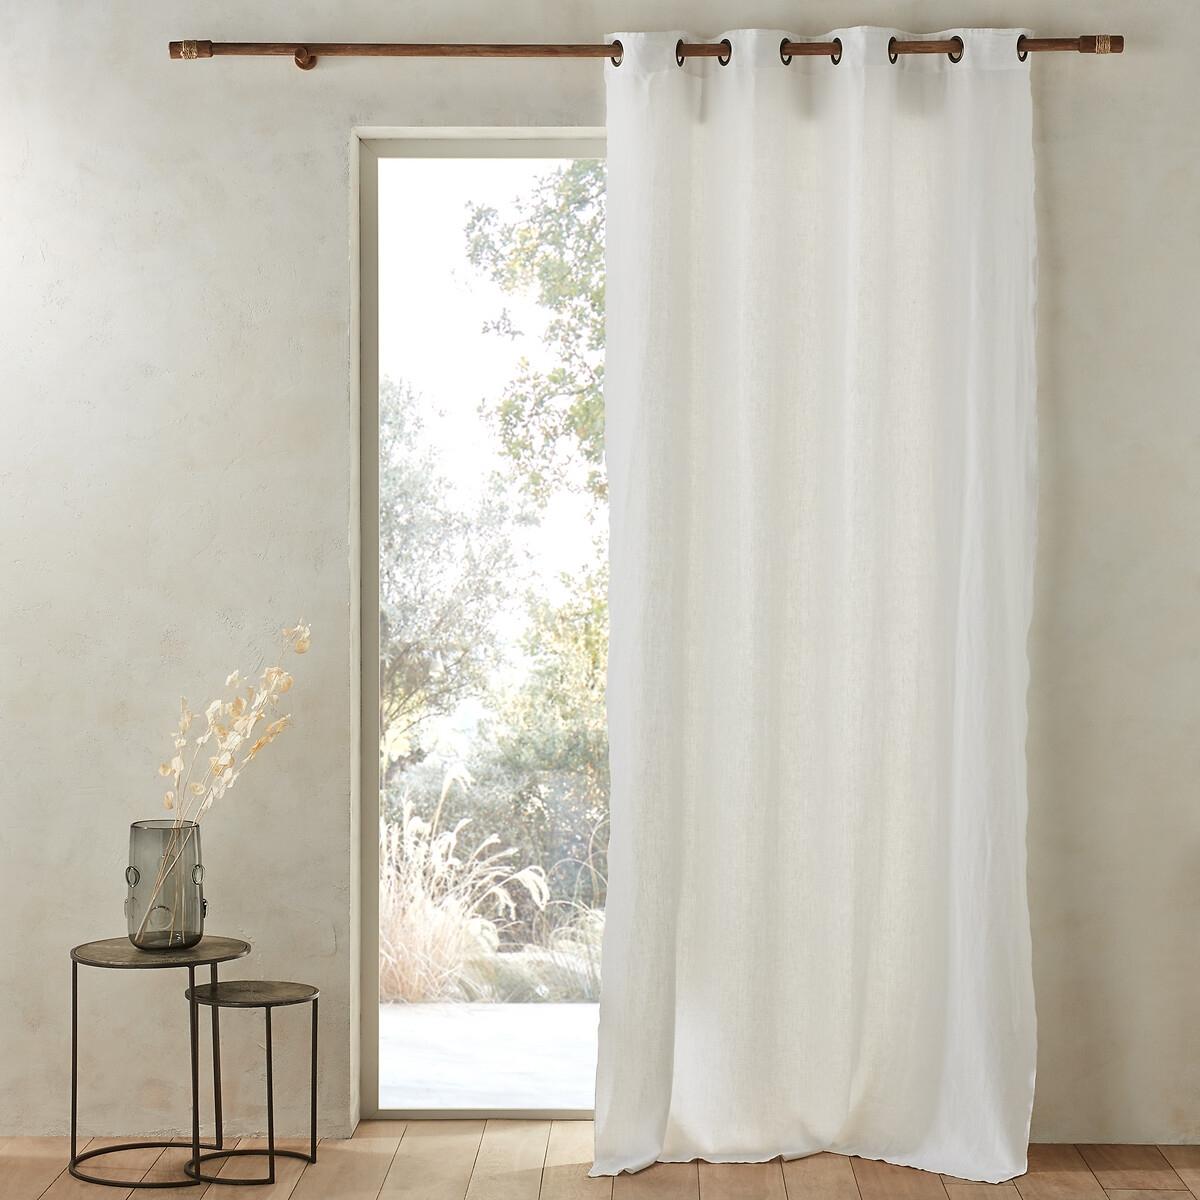 Штора LaRedoute 100 лен Romane 140 x 180 см белый штора для кухни izkomoda sh140iv001 белый 140 40 лен